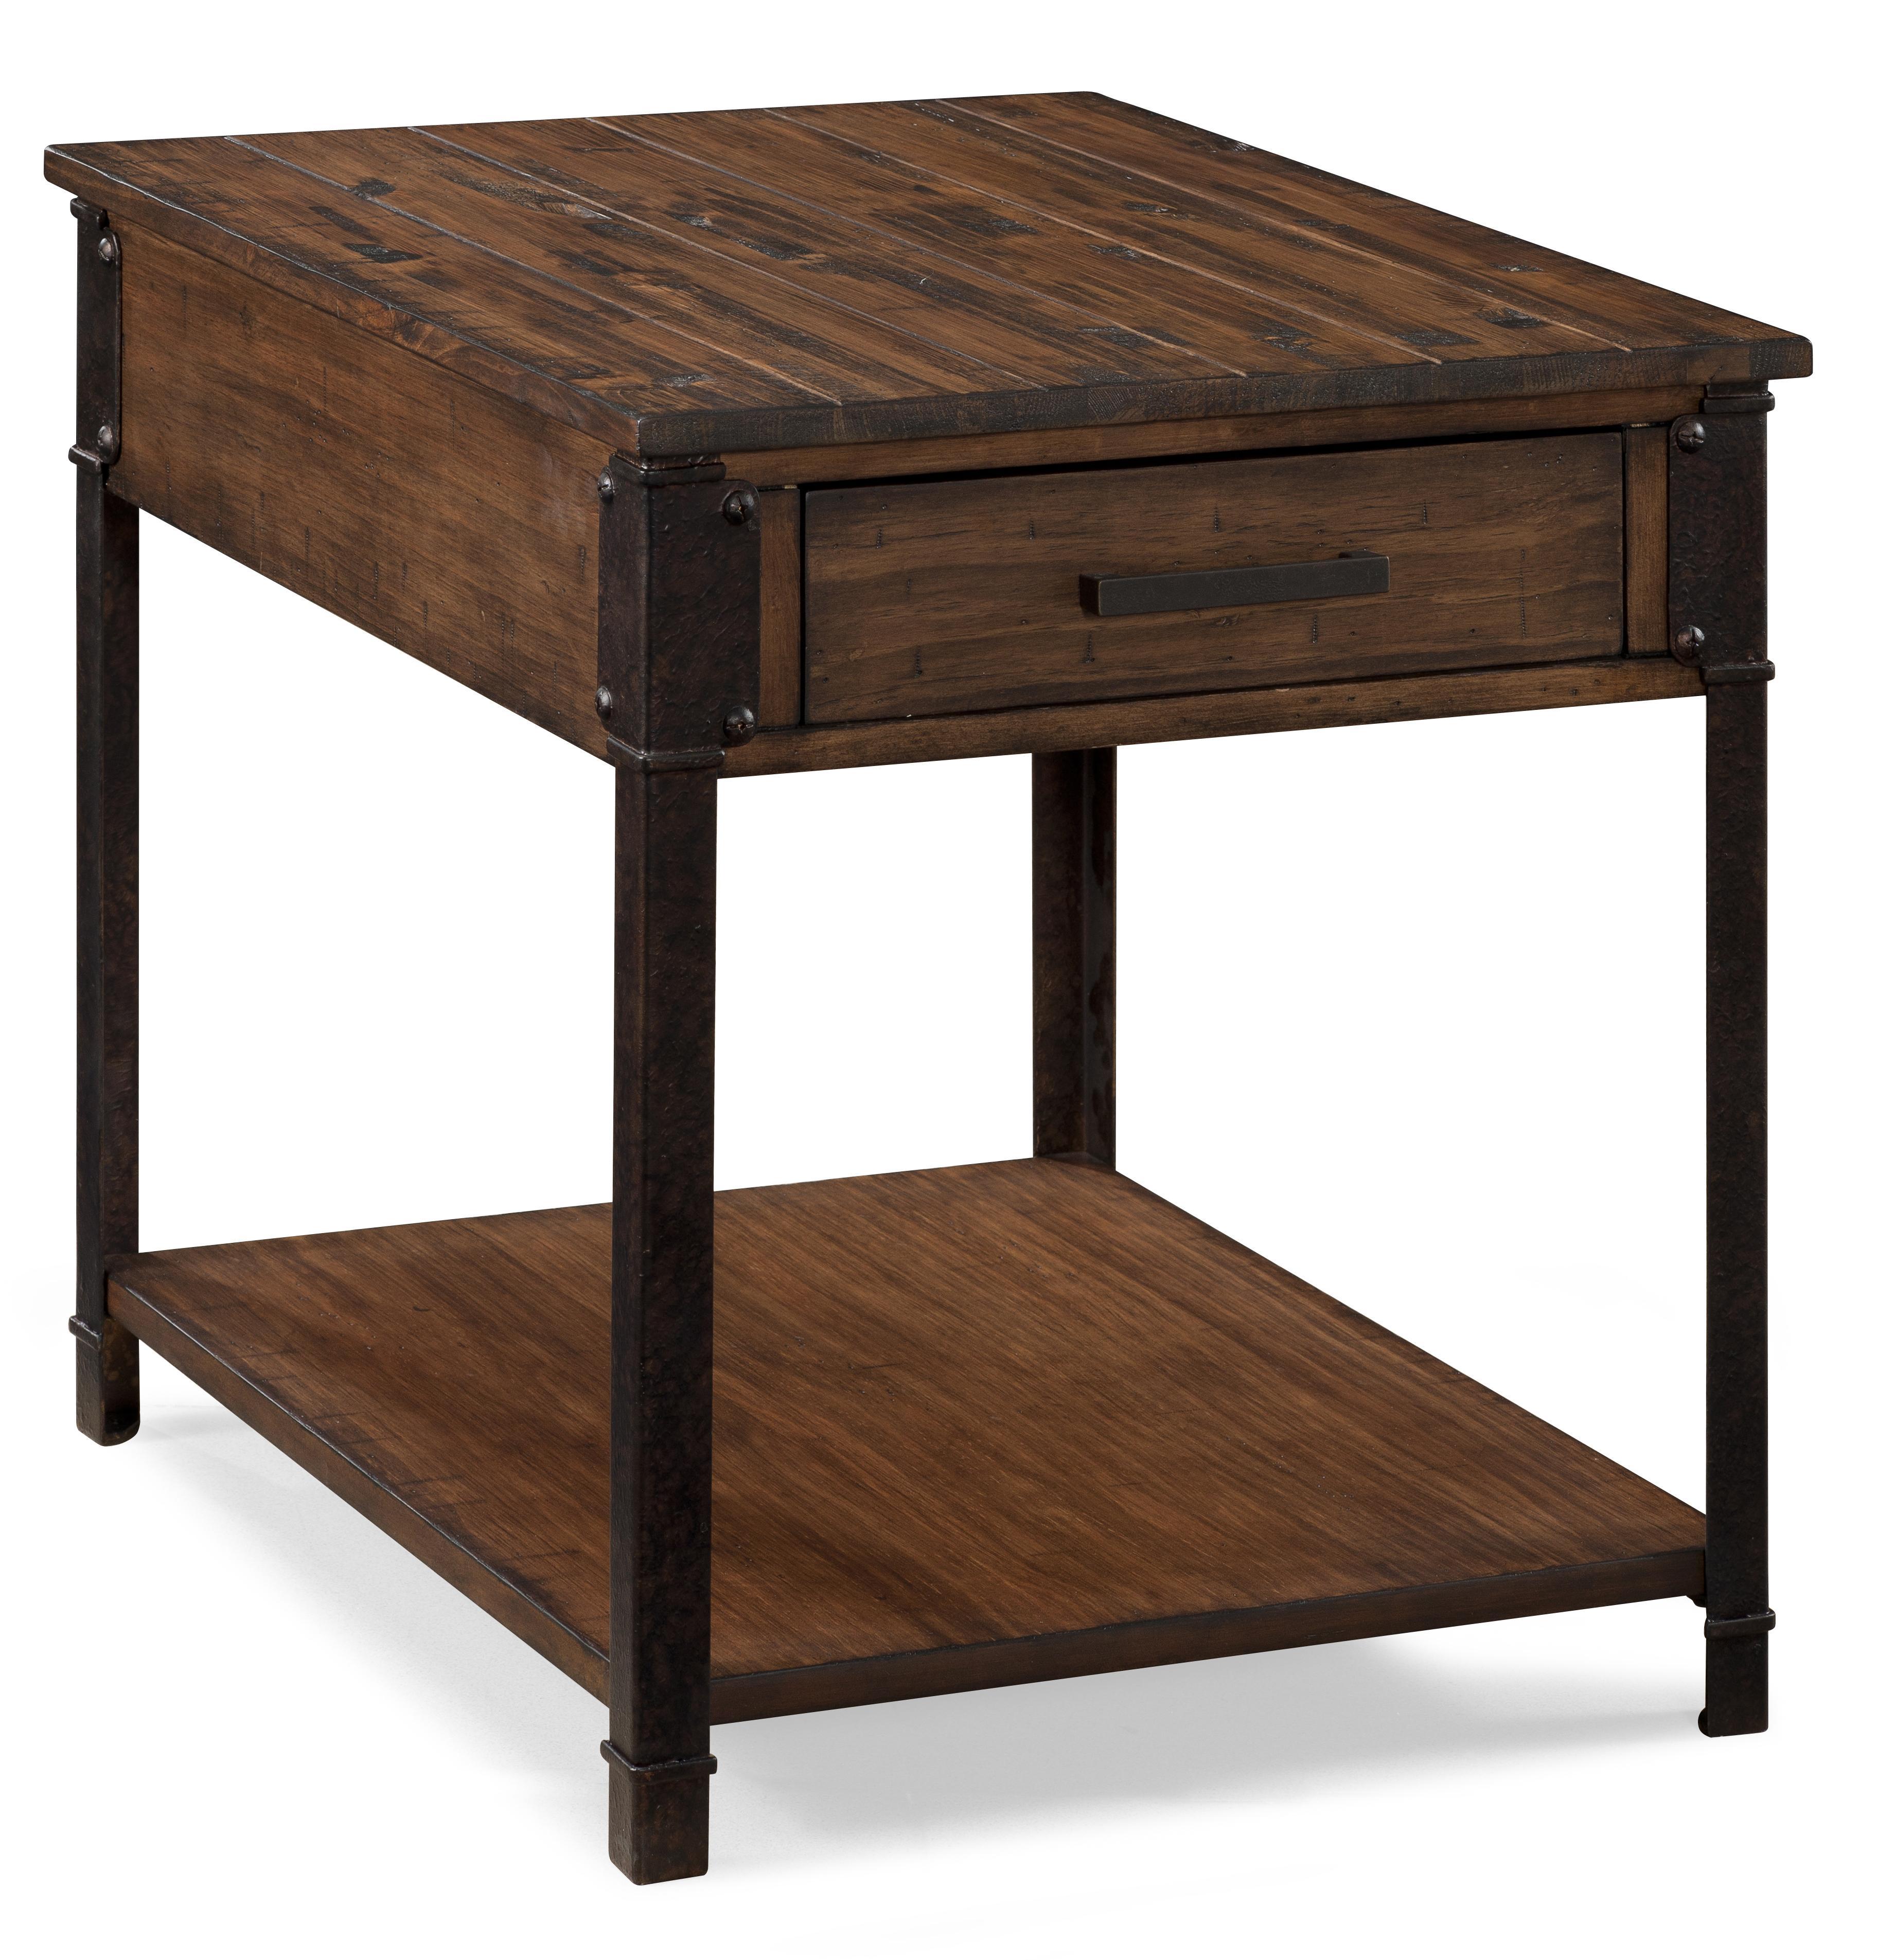 Magnussen Home Larkin Industrial Rectangular End Table